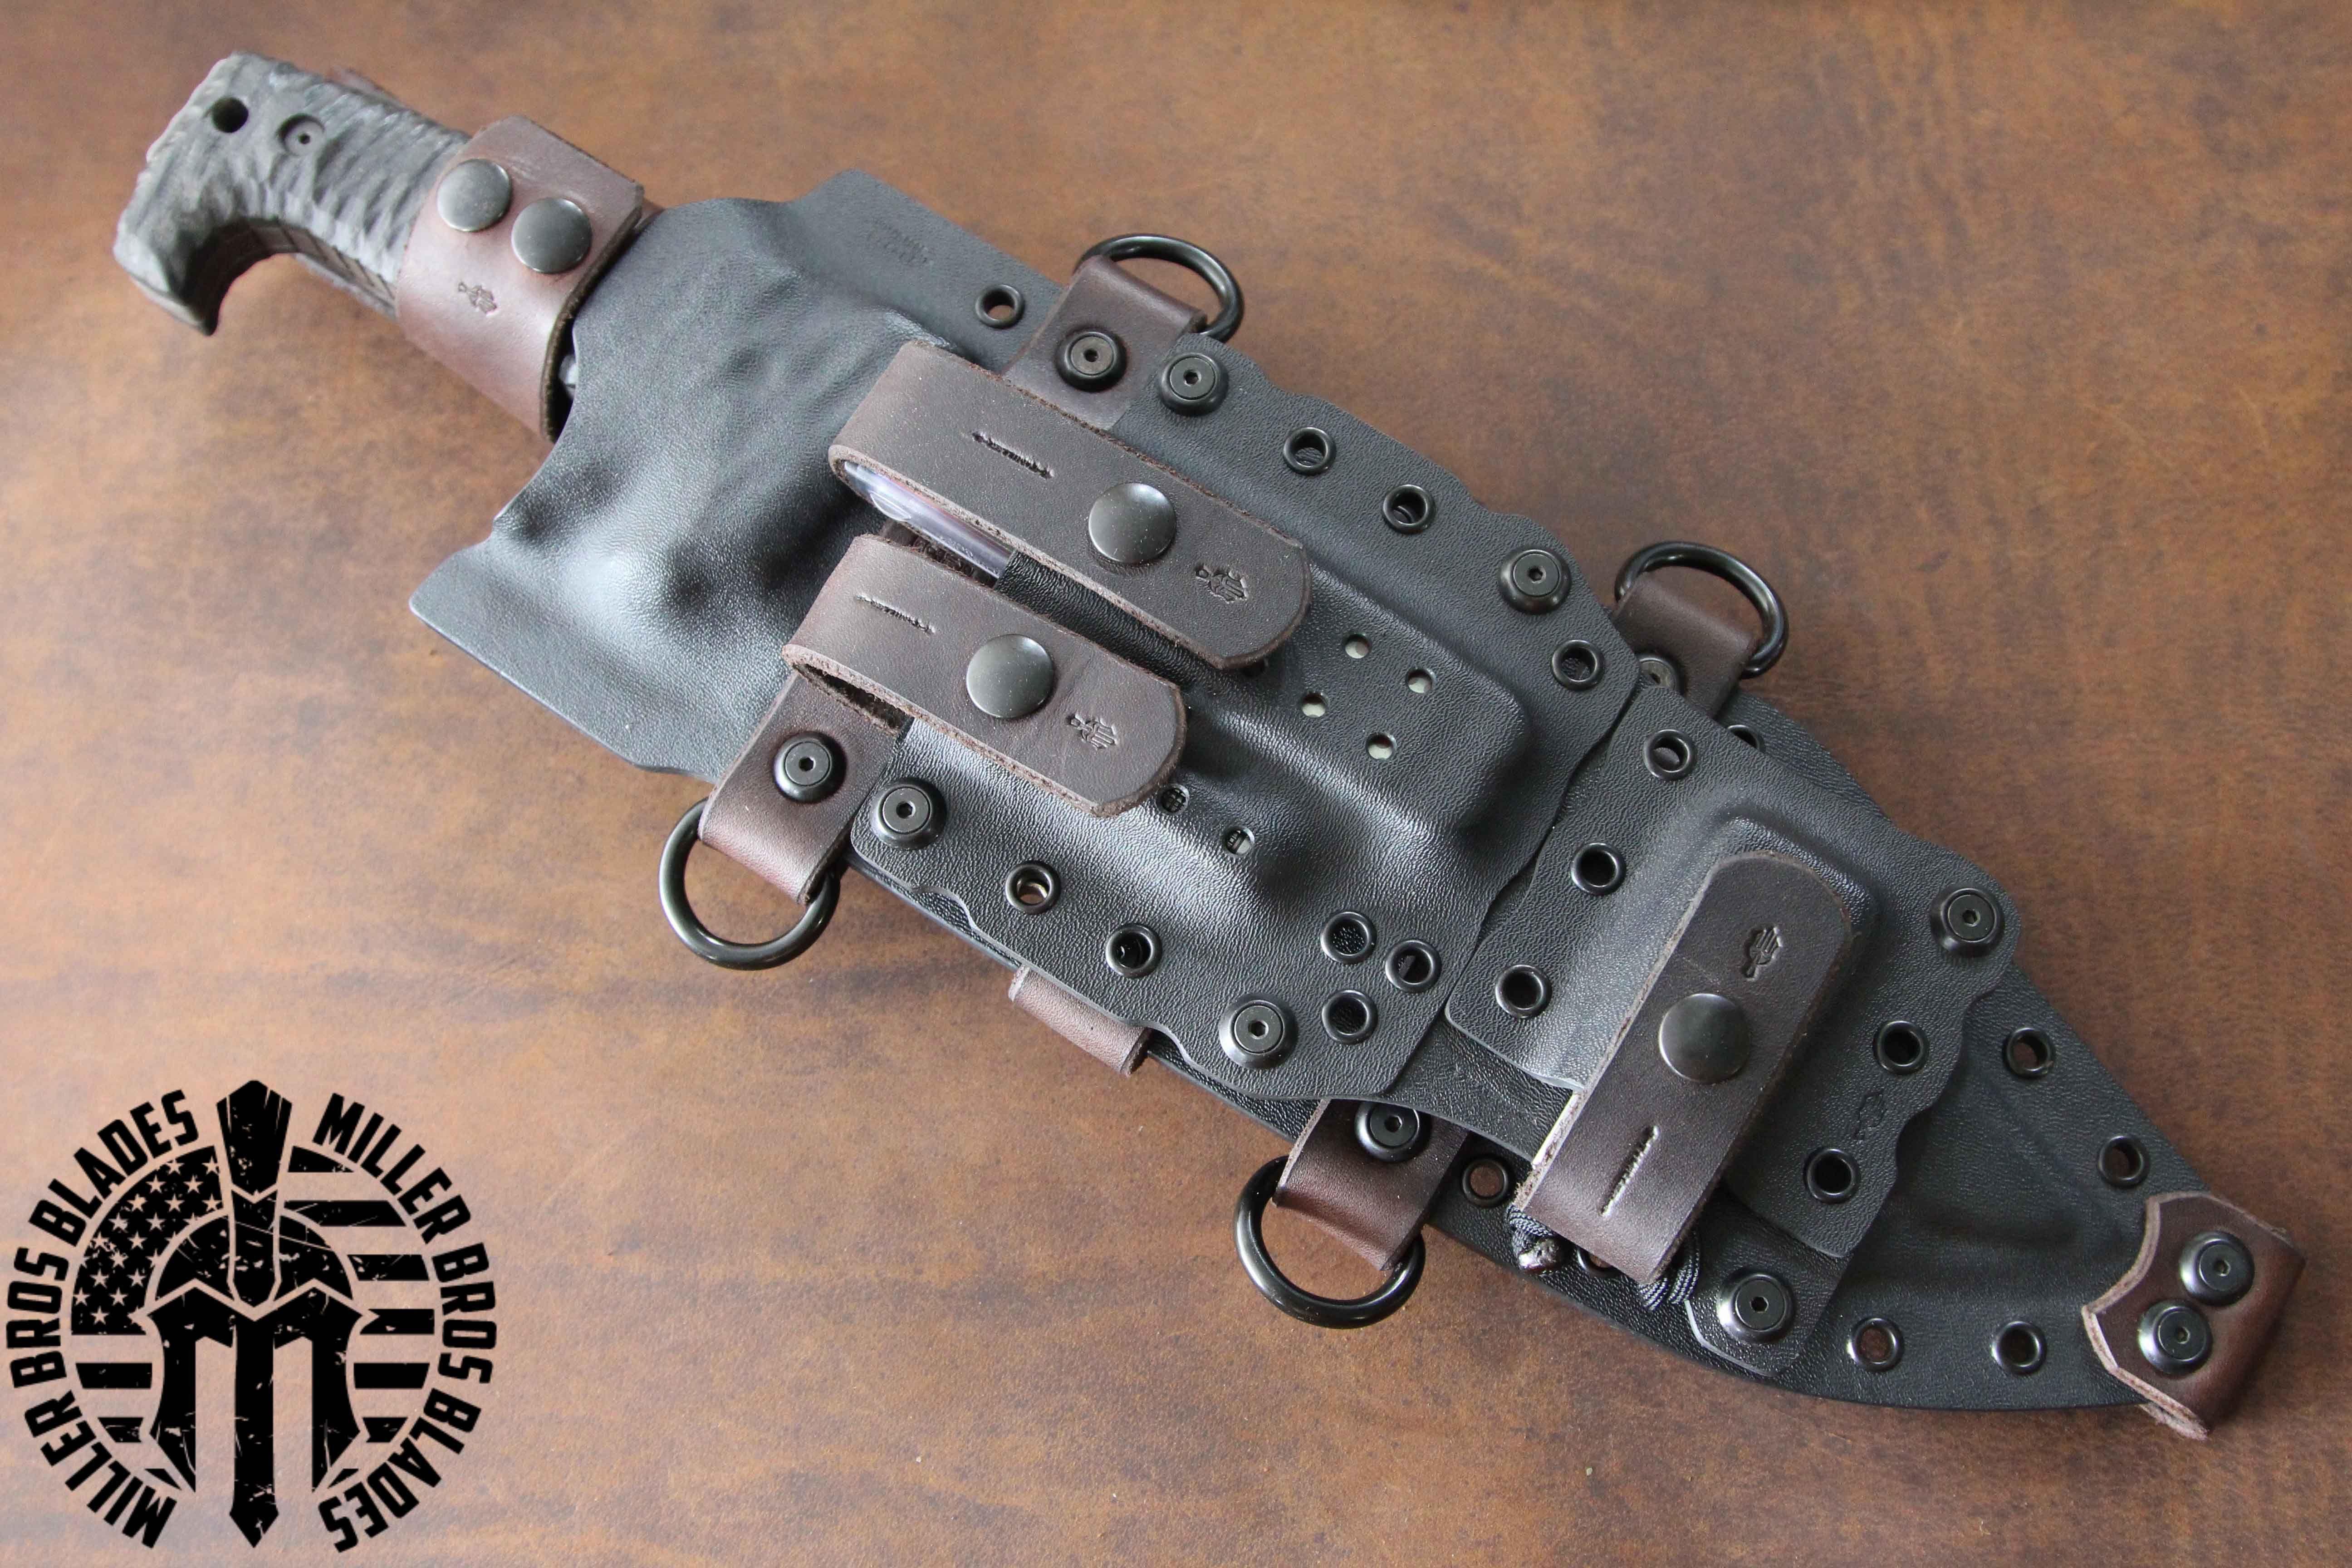 Miller Bros Blades M 28 Knife with custom Kydex sheath This model